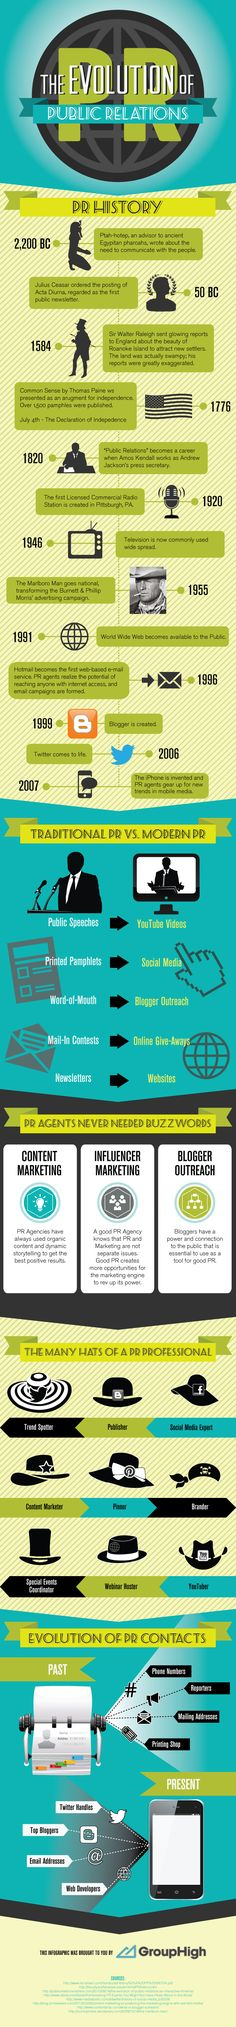 The Evolution of PR #infographic